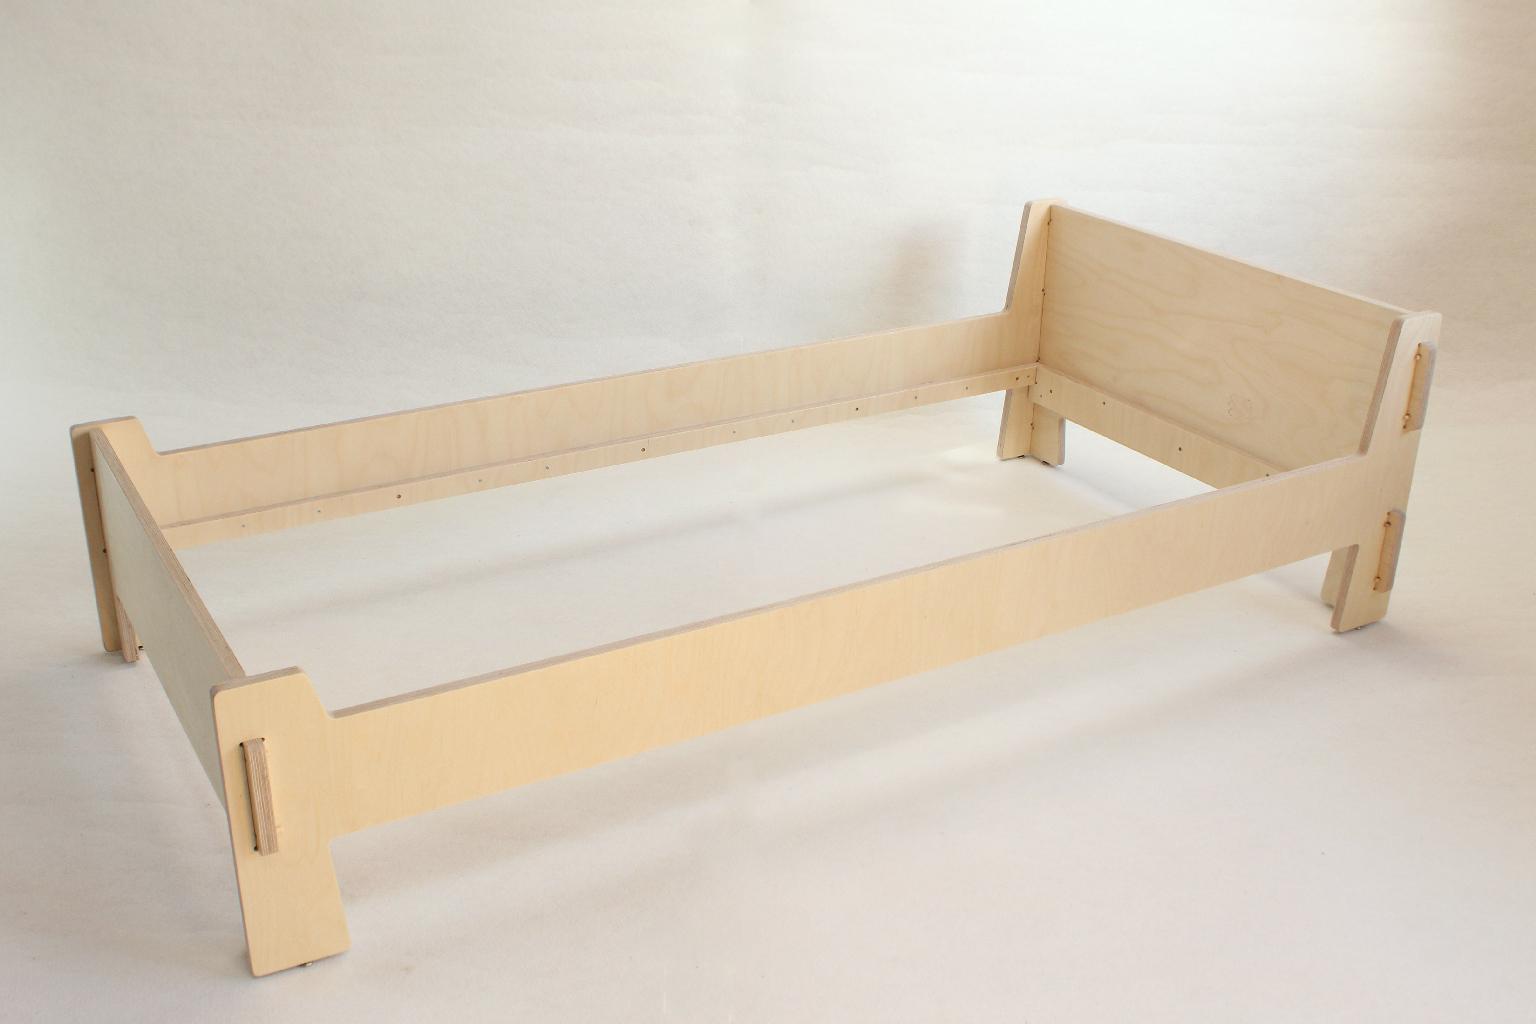 cadre de lit enfant 9018 atelier minassian. Black Bedroom Furniture Sets. Home Design Ideas